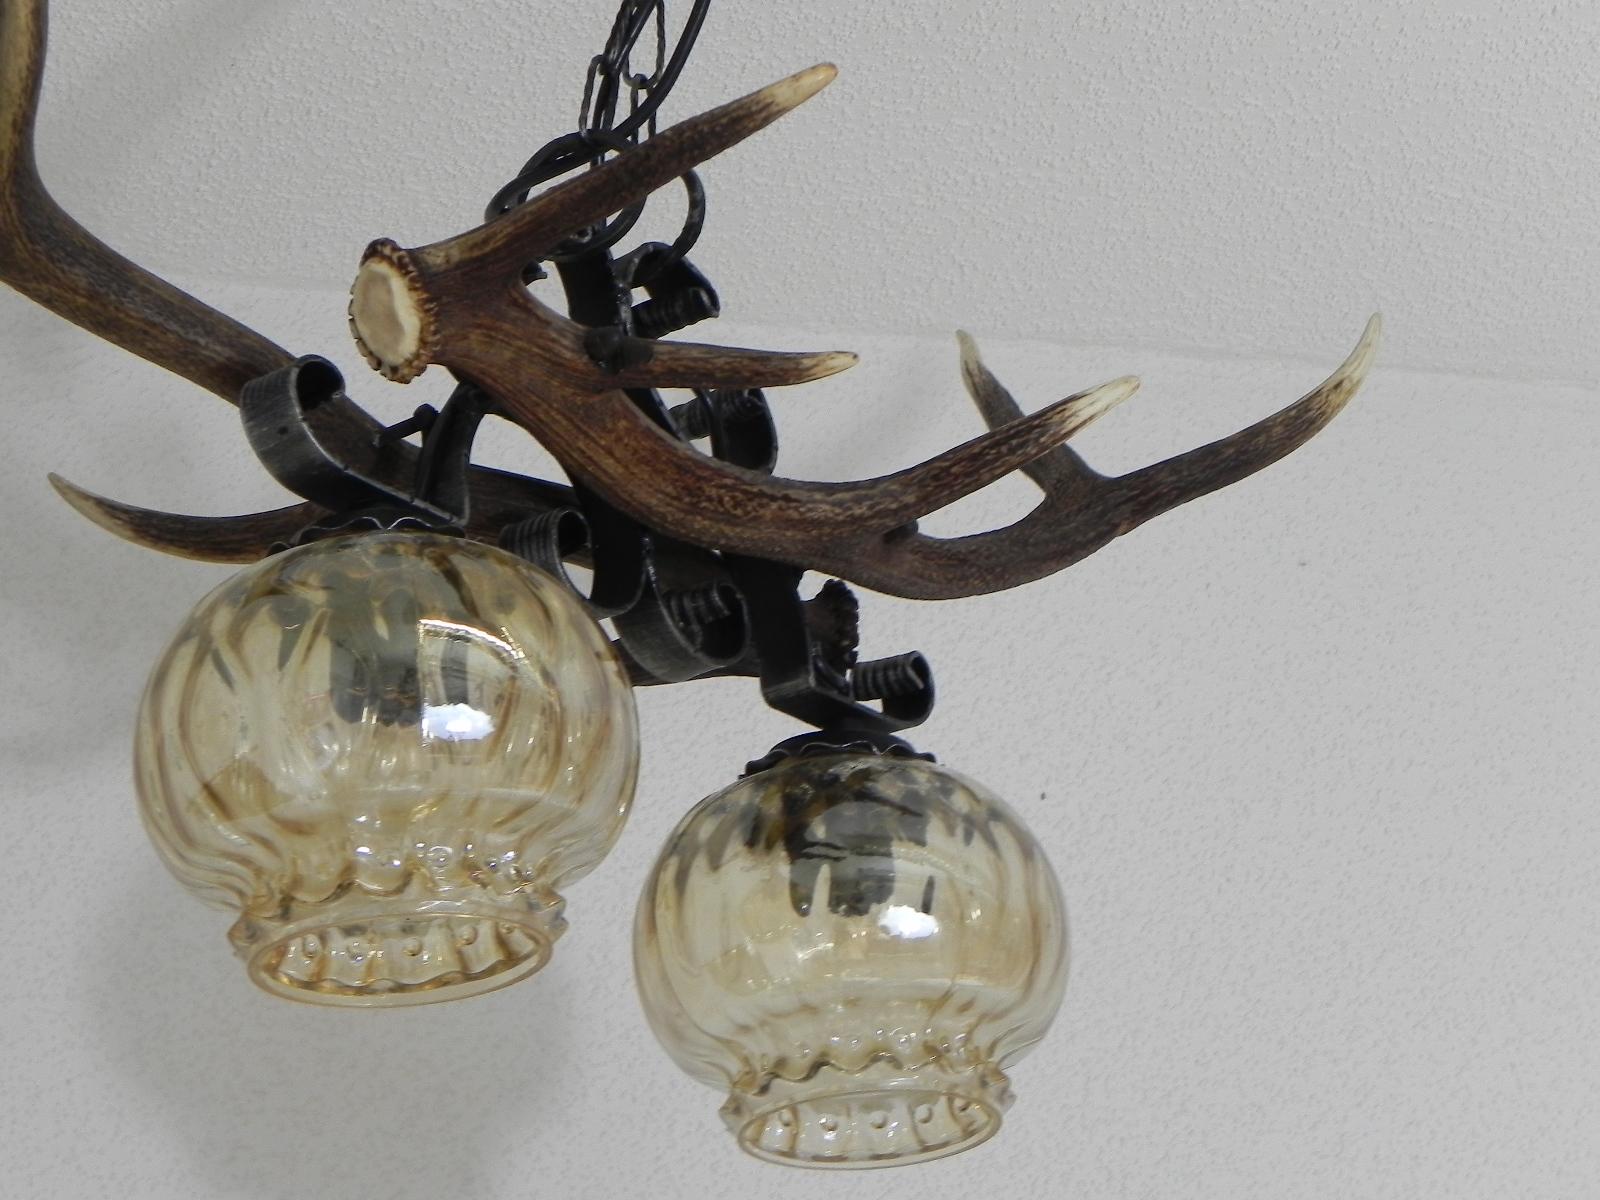 lampe en bois de cerf 2 flammes avec fer forg plafonnier luminaire ebay. Black Bedroom Furniture Sets. Home Design Ideas